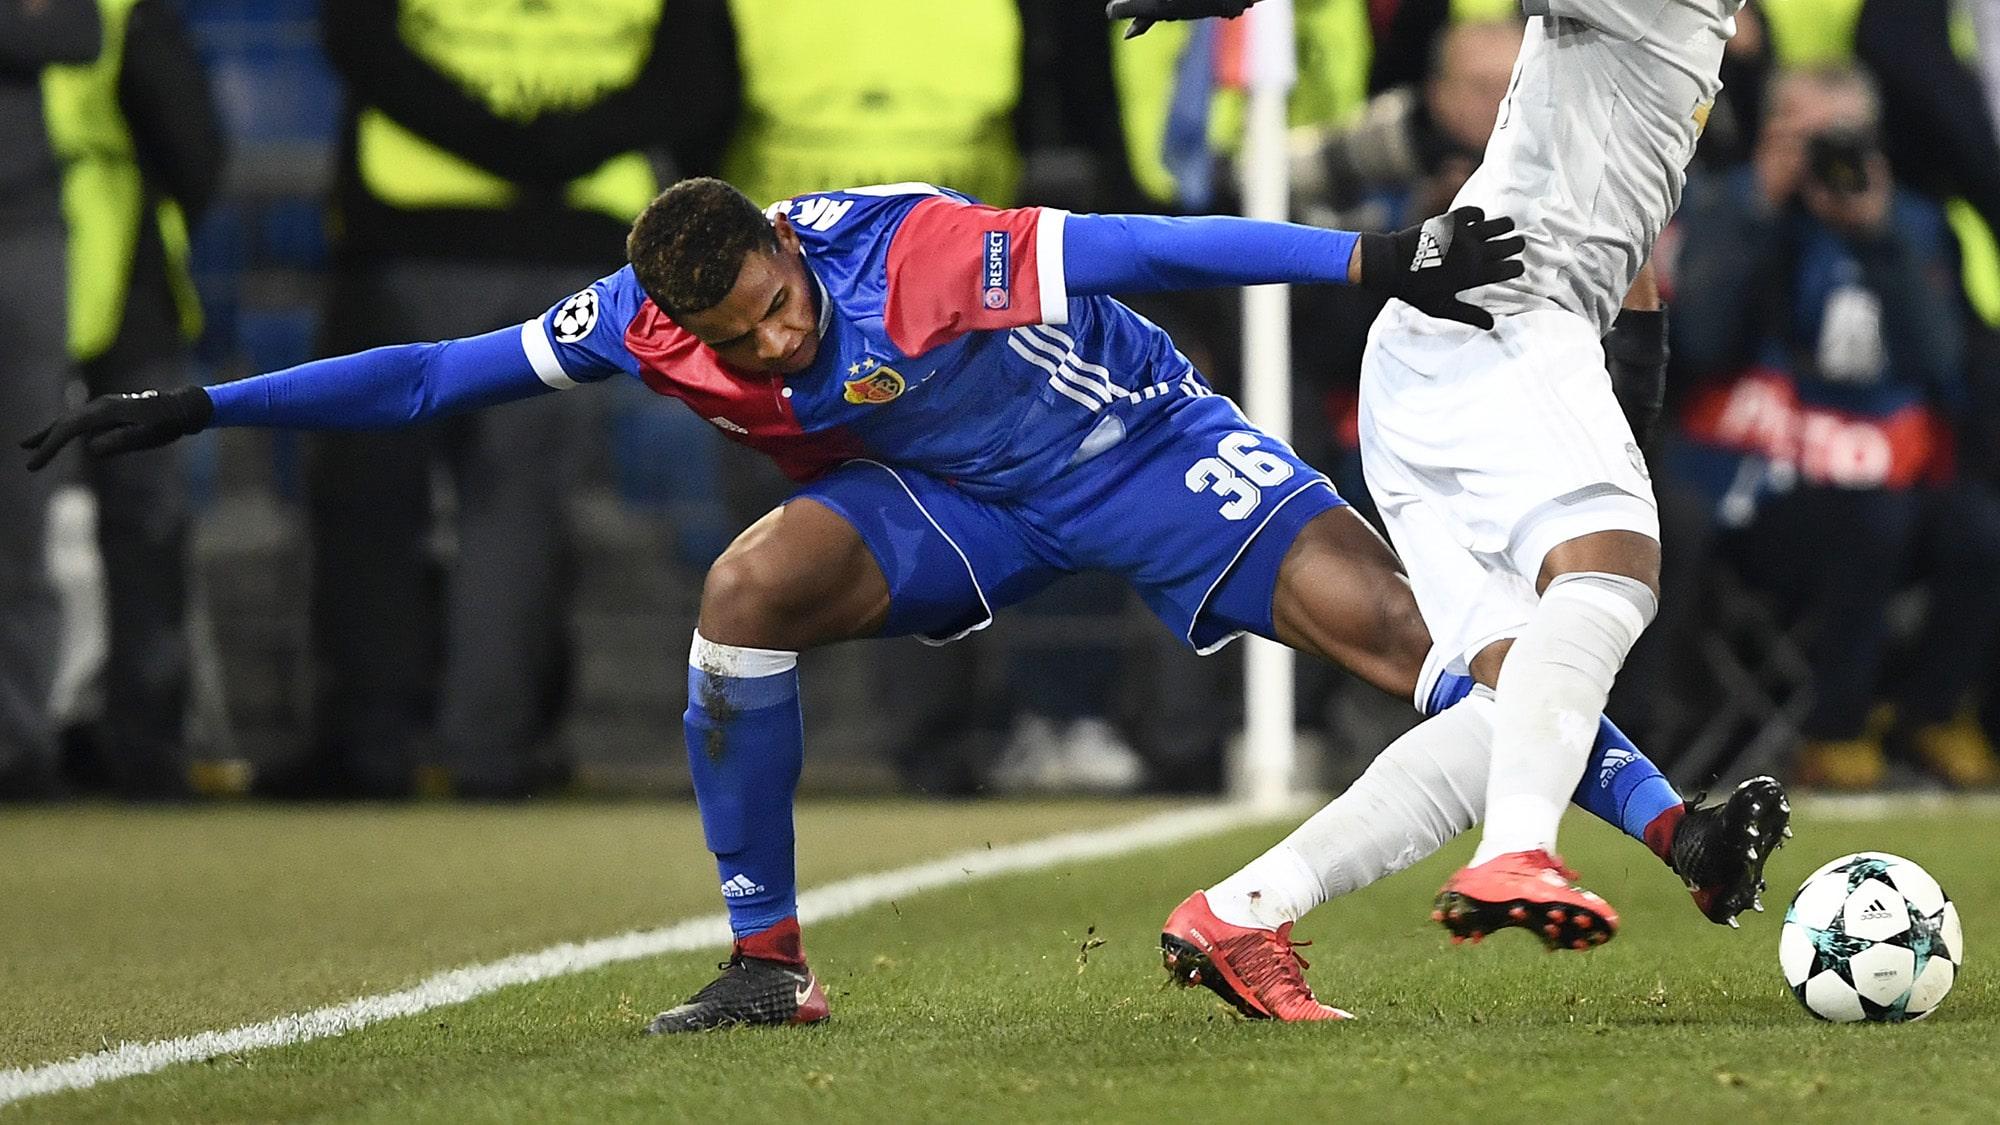 22.11.2017; Basel; Fussball Champions League - FC Basel - Manchester United; Manuel Akanji (Basel) gegen Anthony Martial (Ma